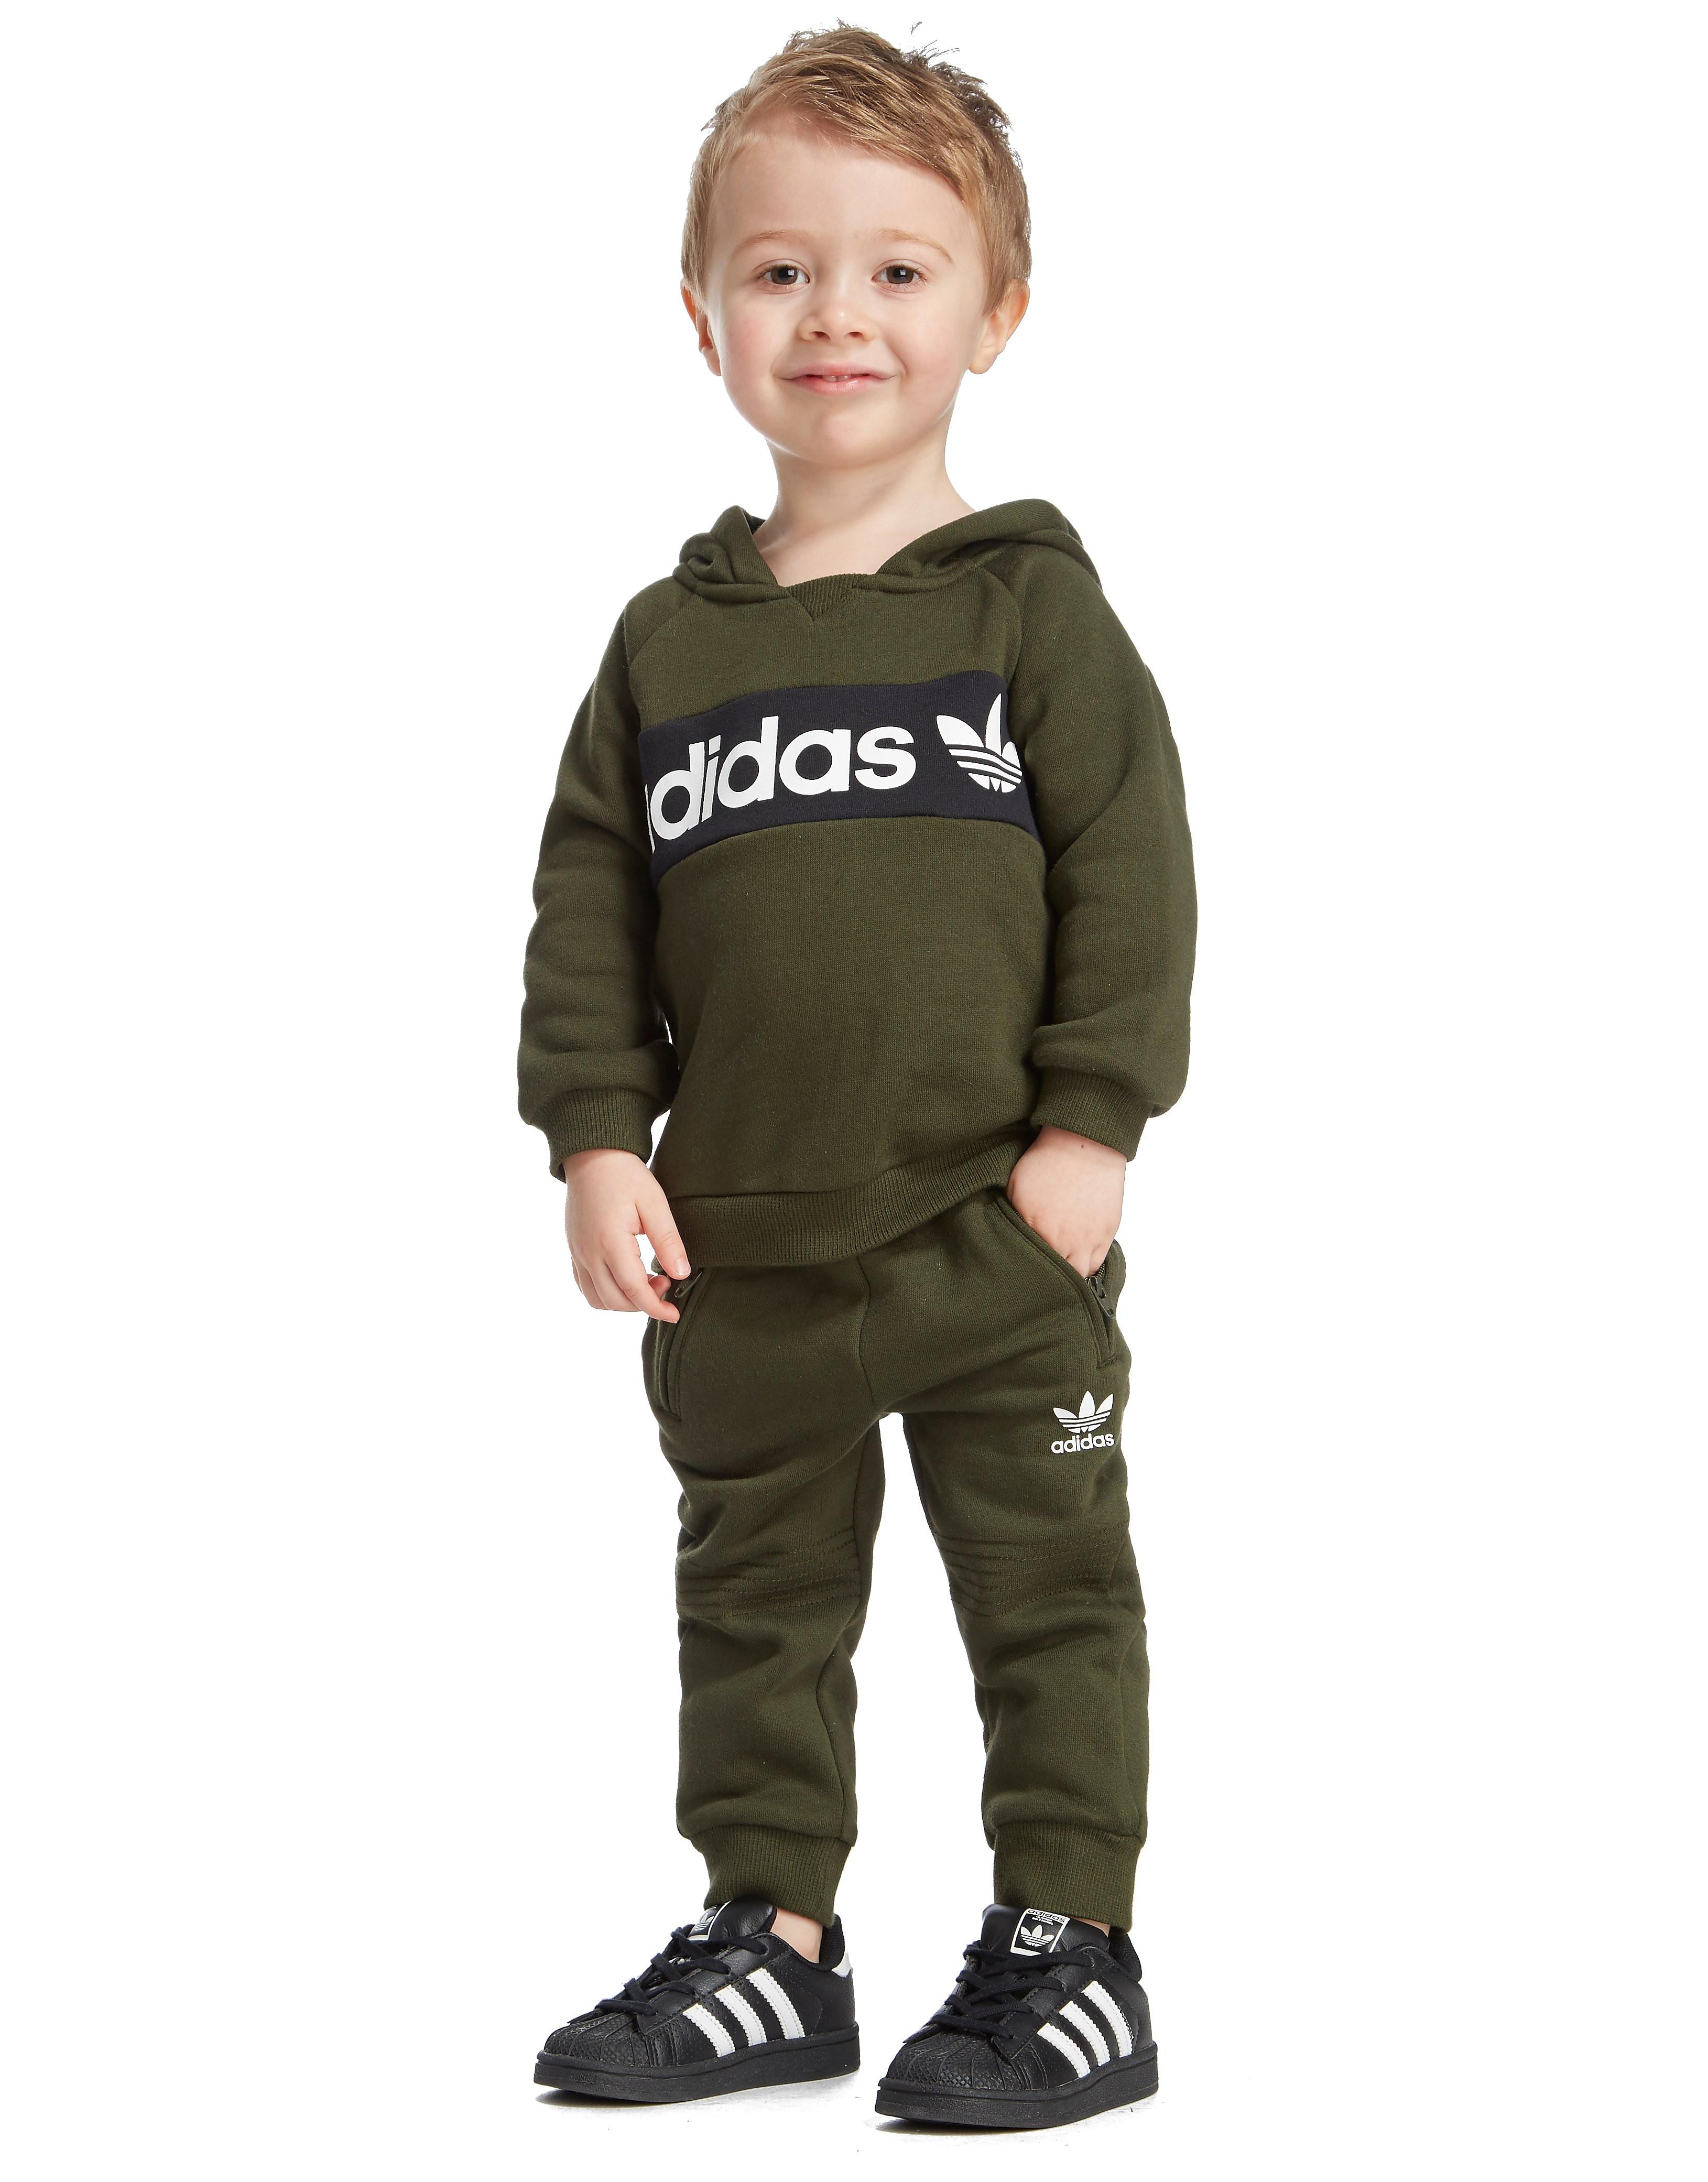 adidas Originals Logo Overhead Hoodie Infant